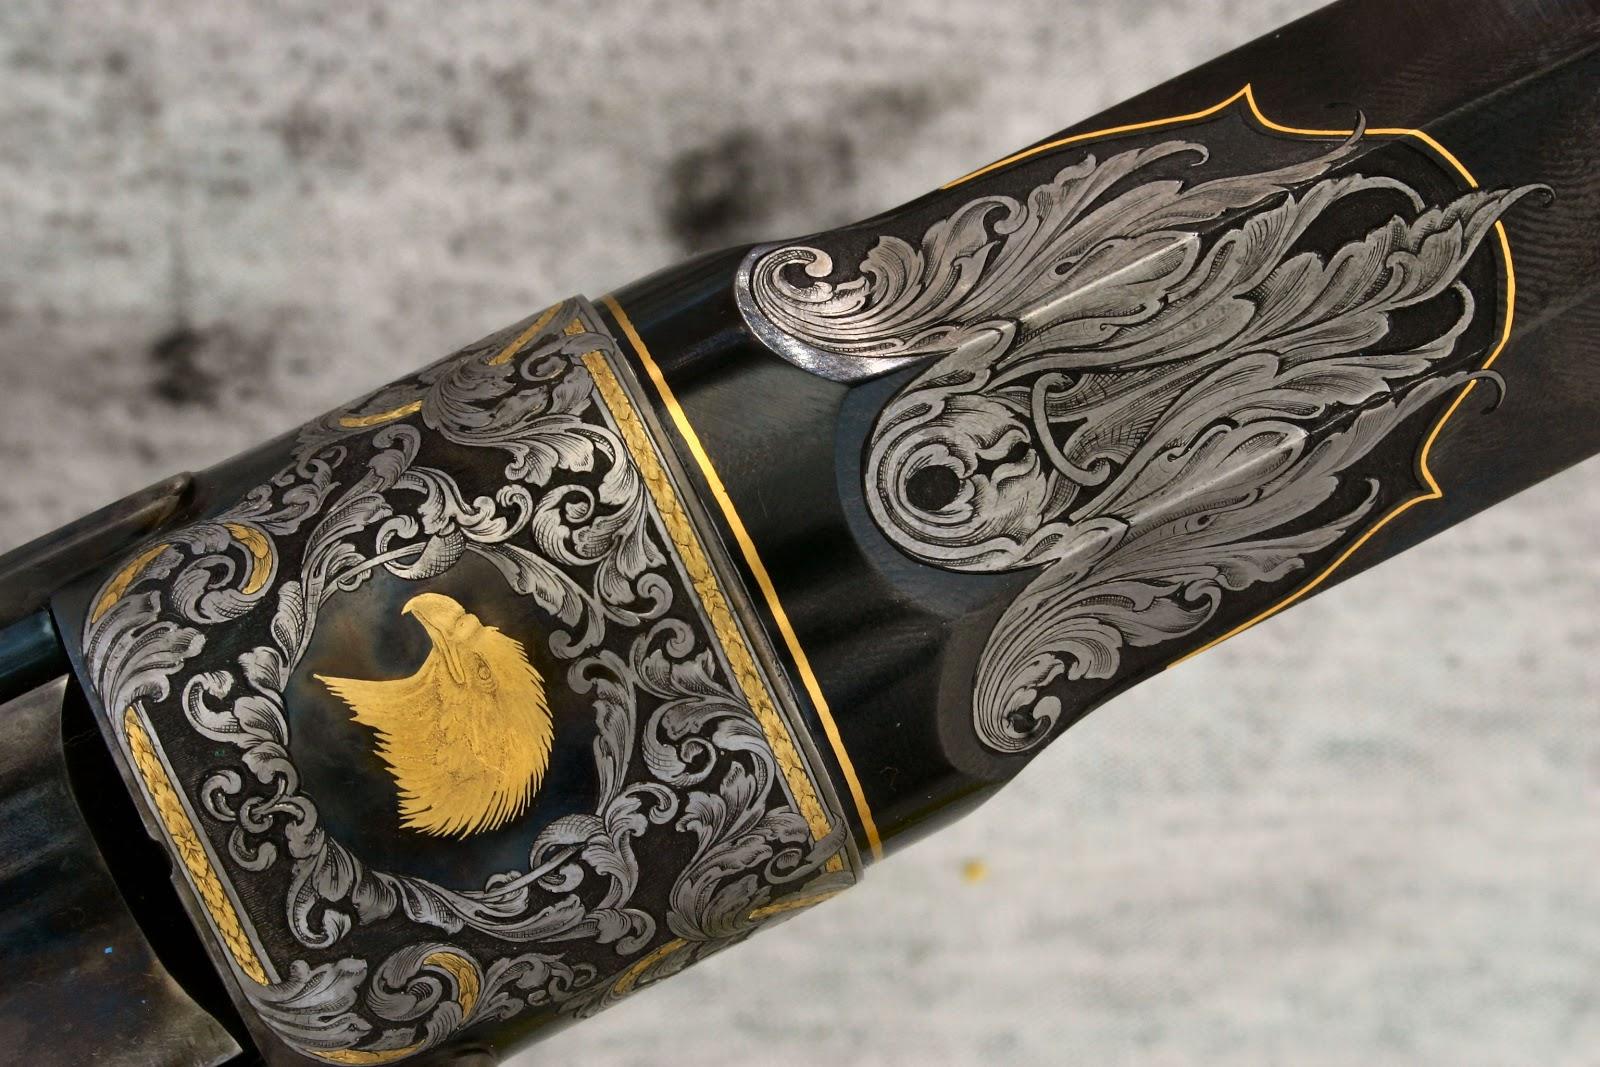 Jim Blair Engraving Gun Engraving The Art And